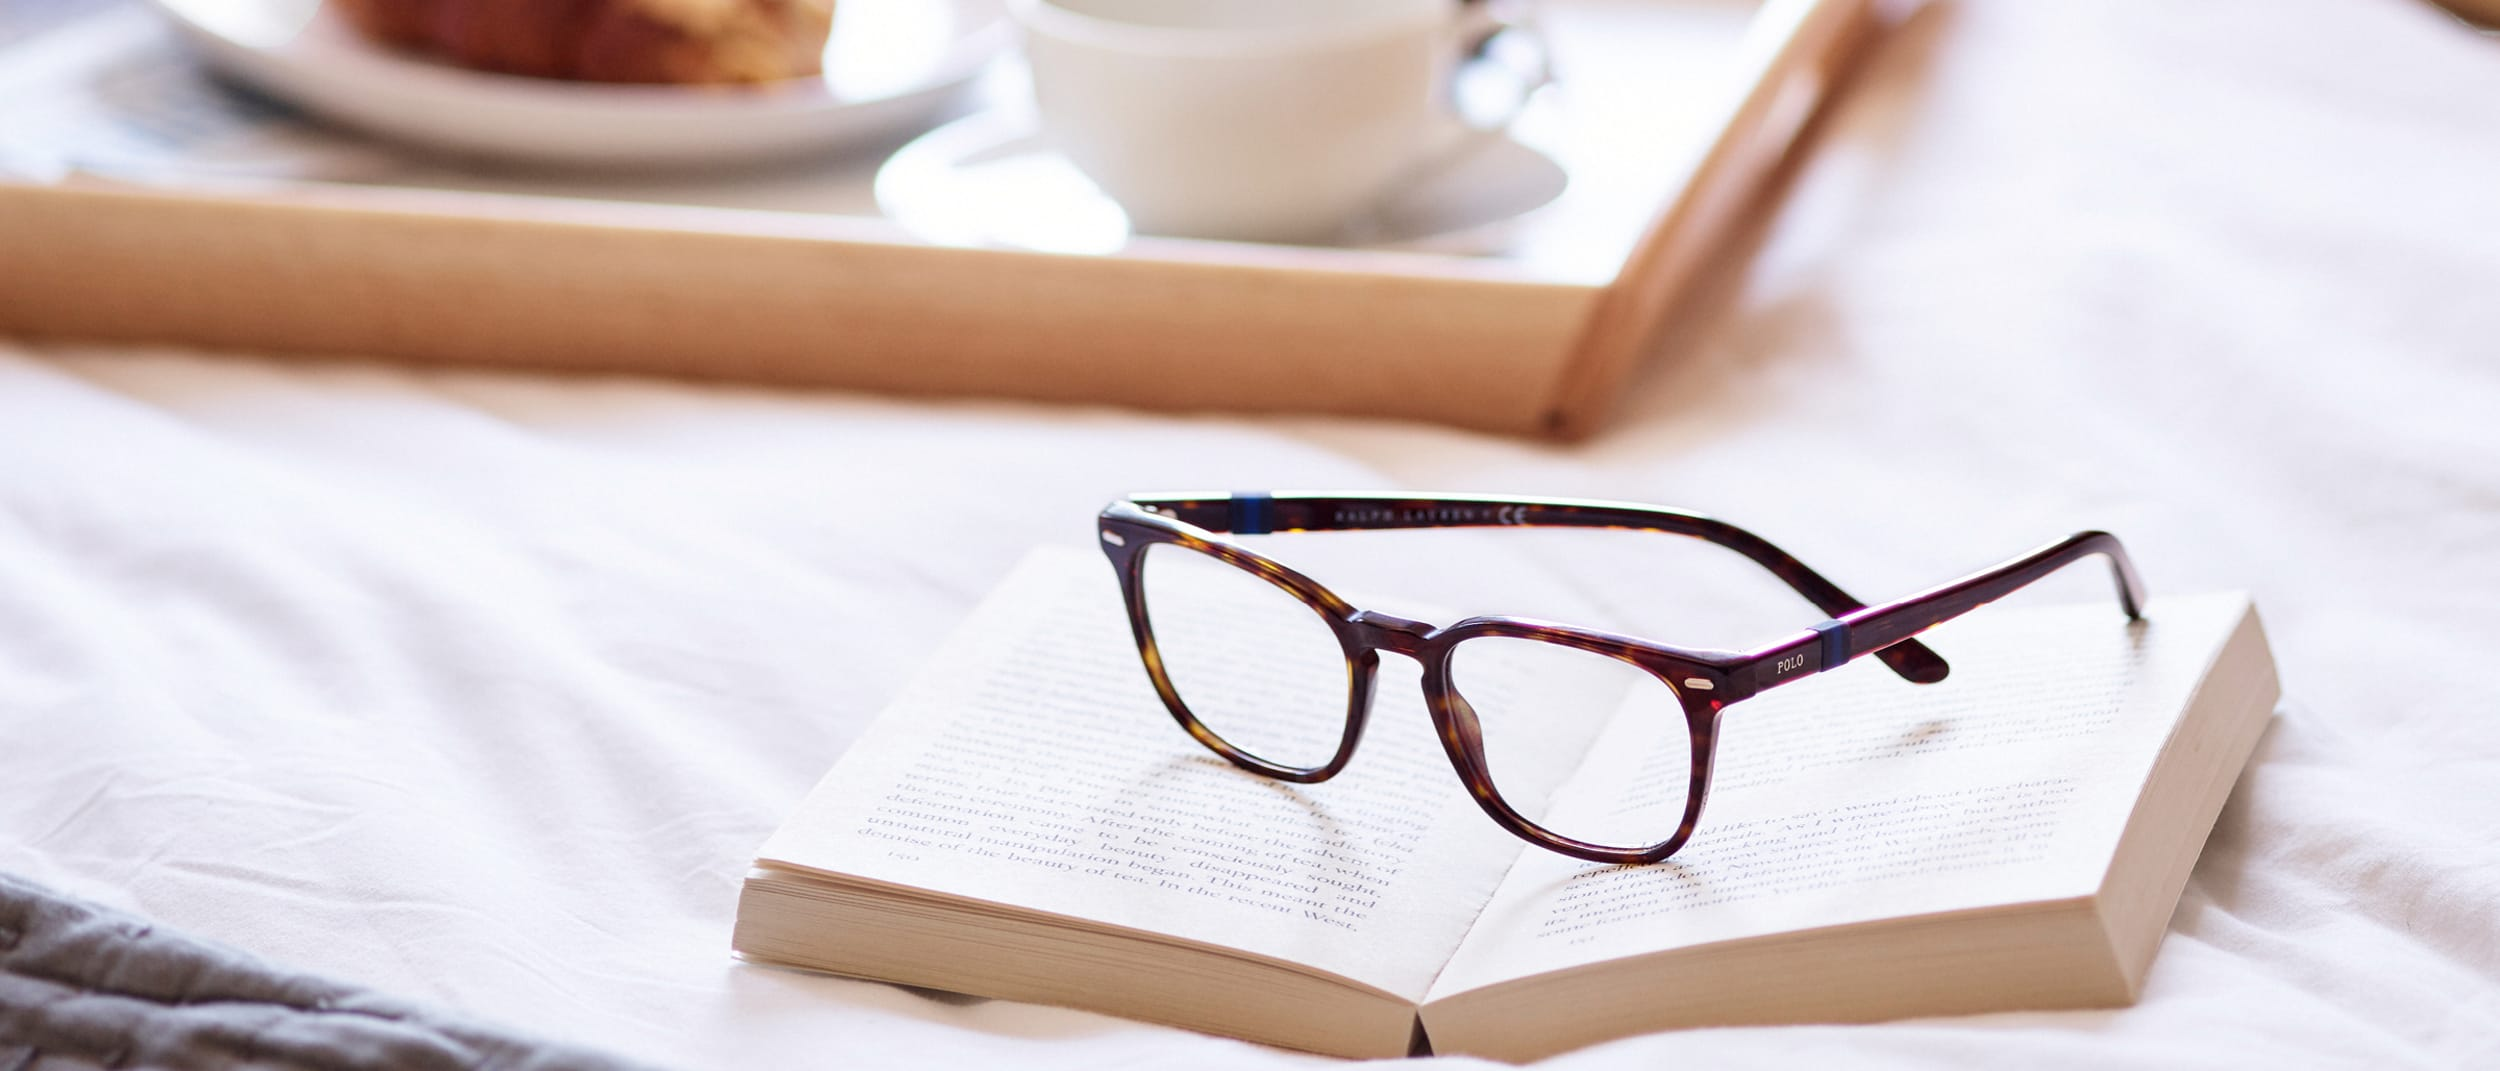 OPSM: Up to 50% off prescription glasses & sunglasses